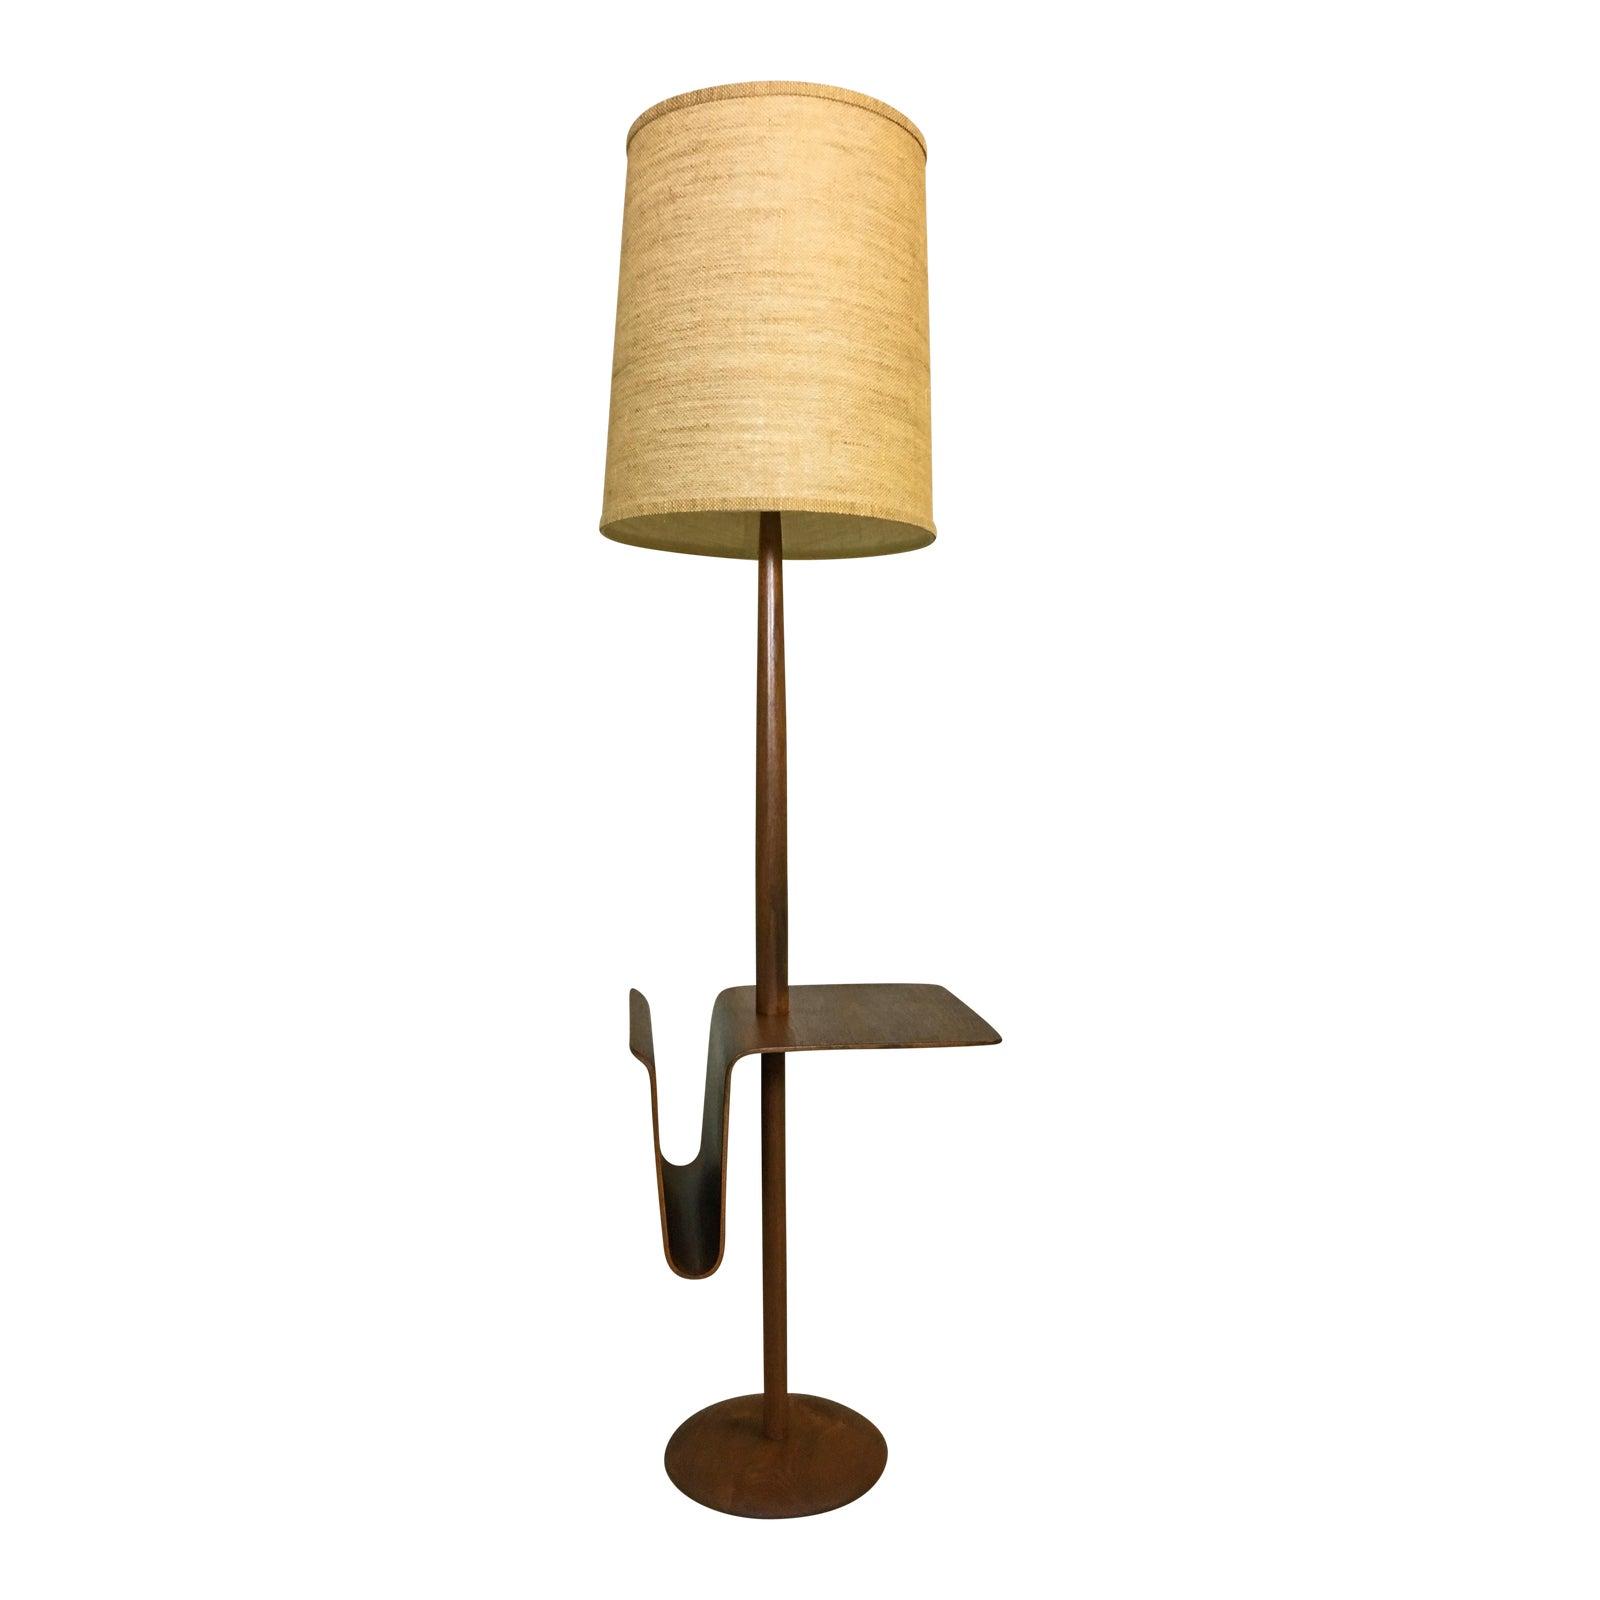 Mid Century Teak Laurel Floor Lamp With Side Table And